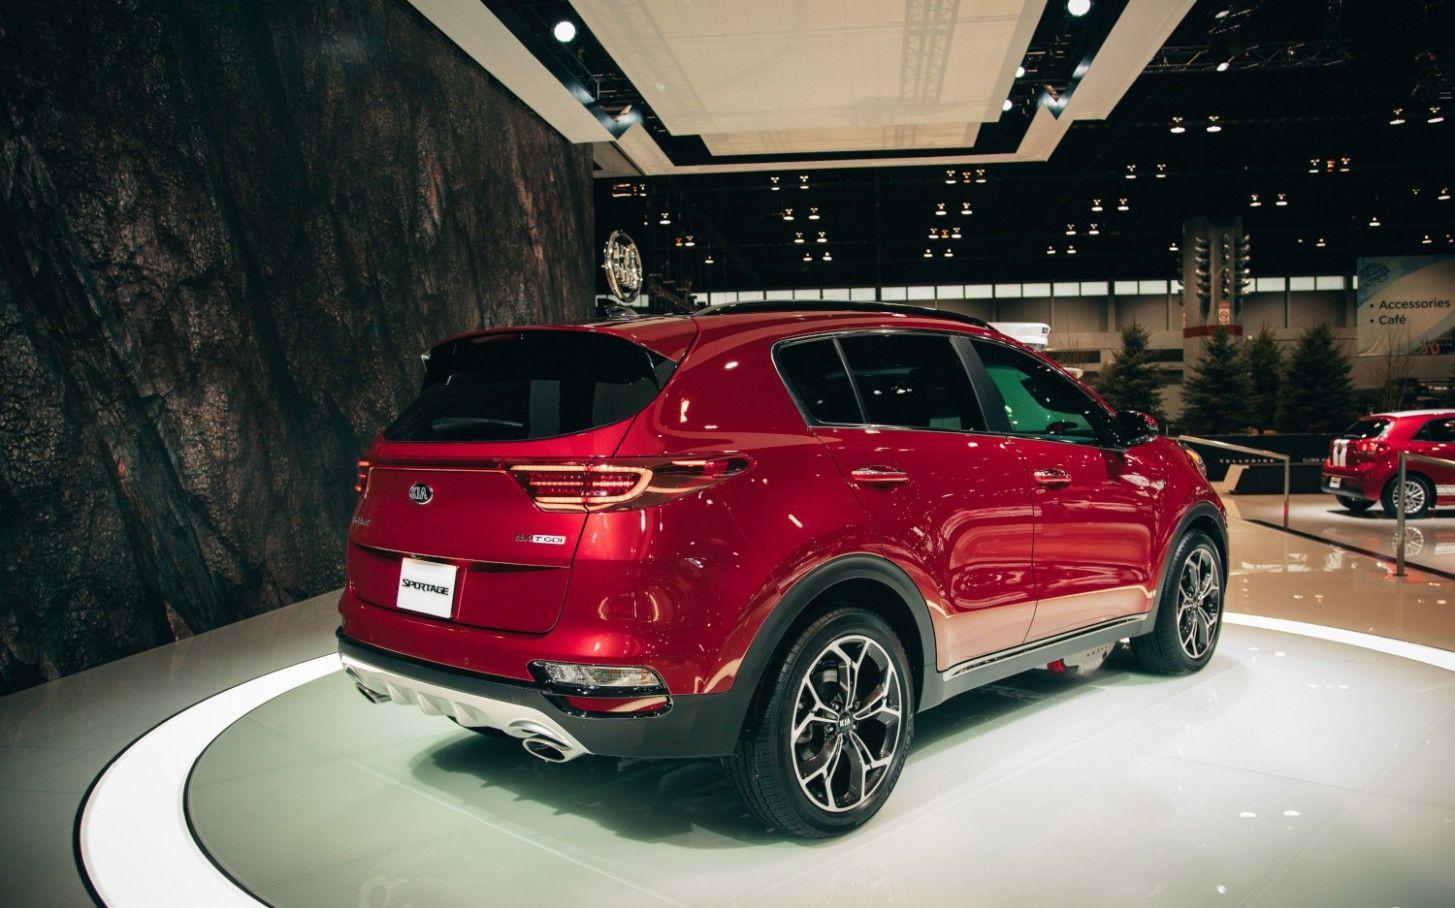 How 2020 Suzuki Sx4 Design Can Increase Your